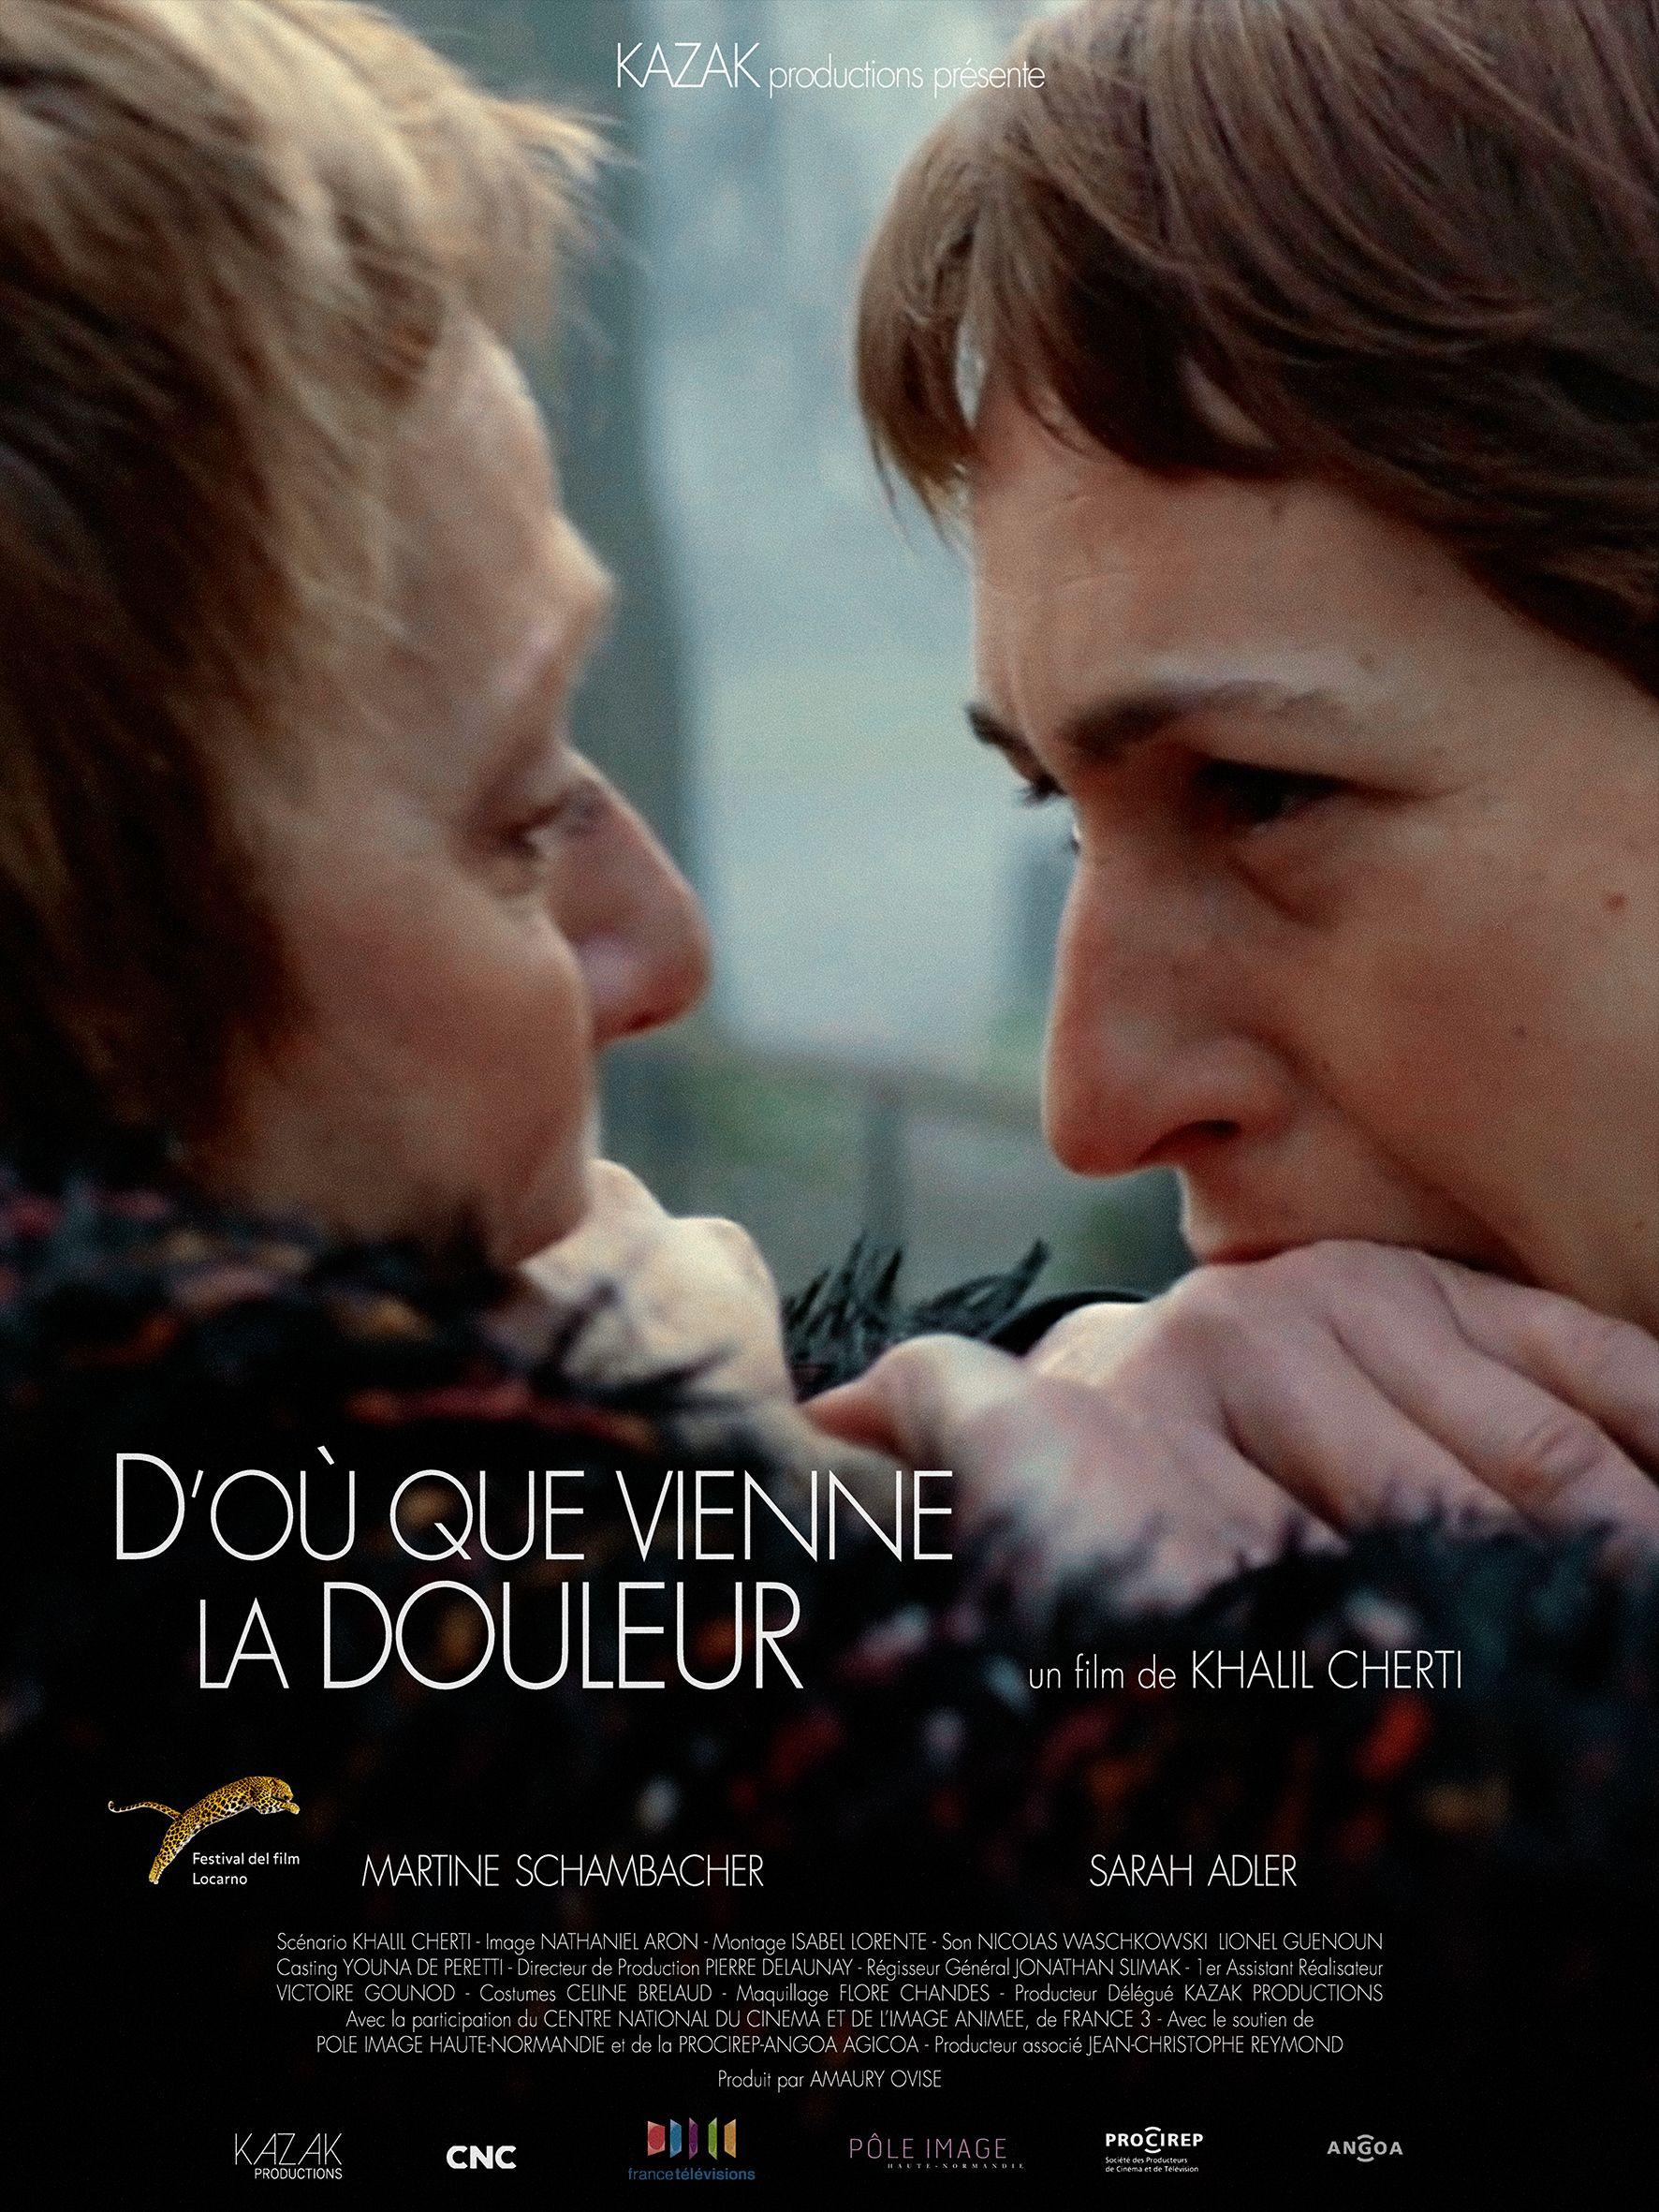 DE DONDE VENGA EL DOLOR (D'OÙ QUE VIENNE LA DOULEUR) | Khalil Cherti • Drama • Francia • 2013 • 37 min